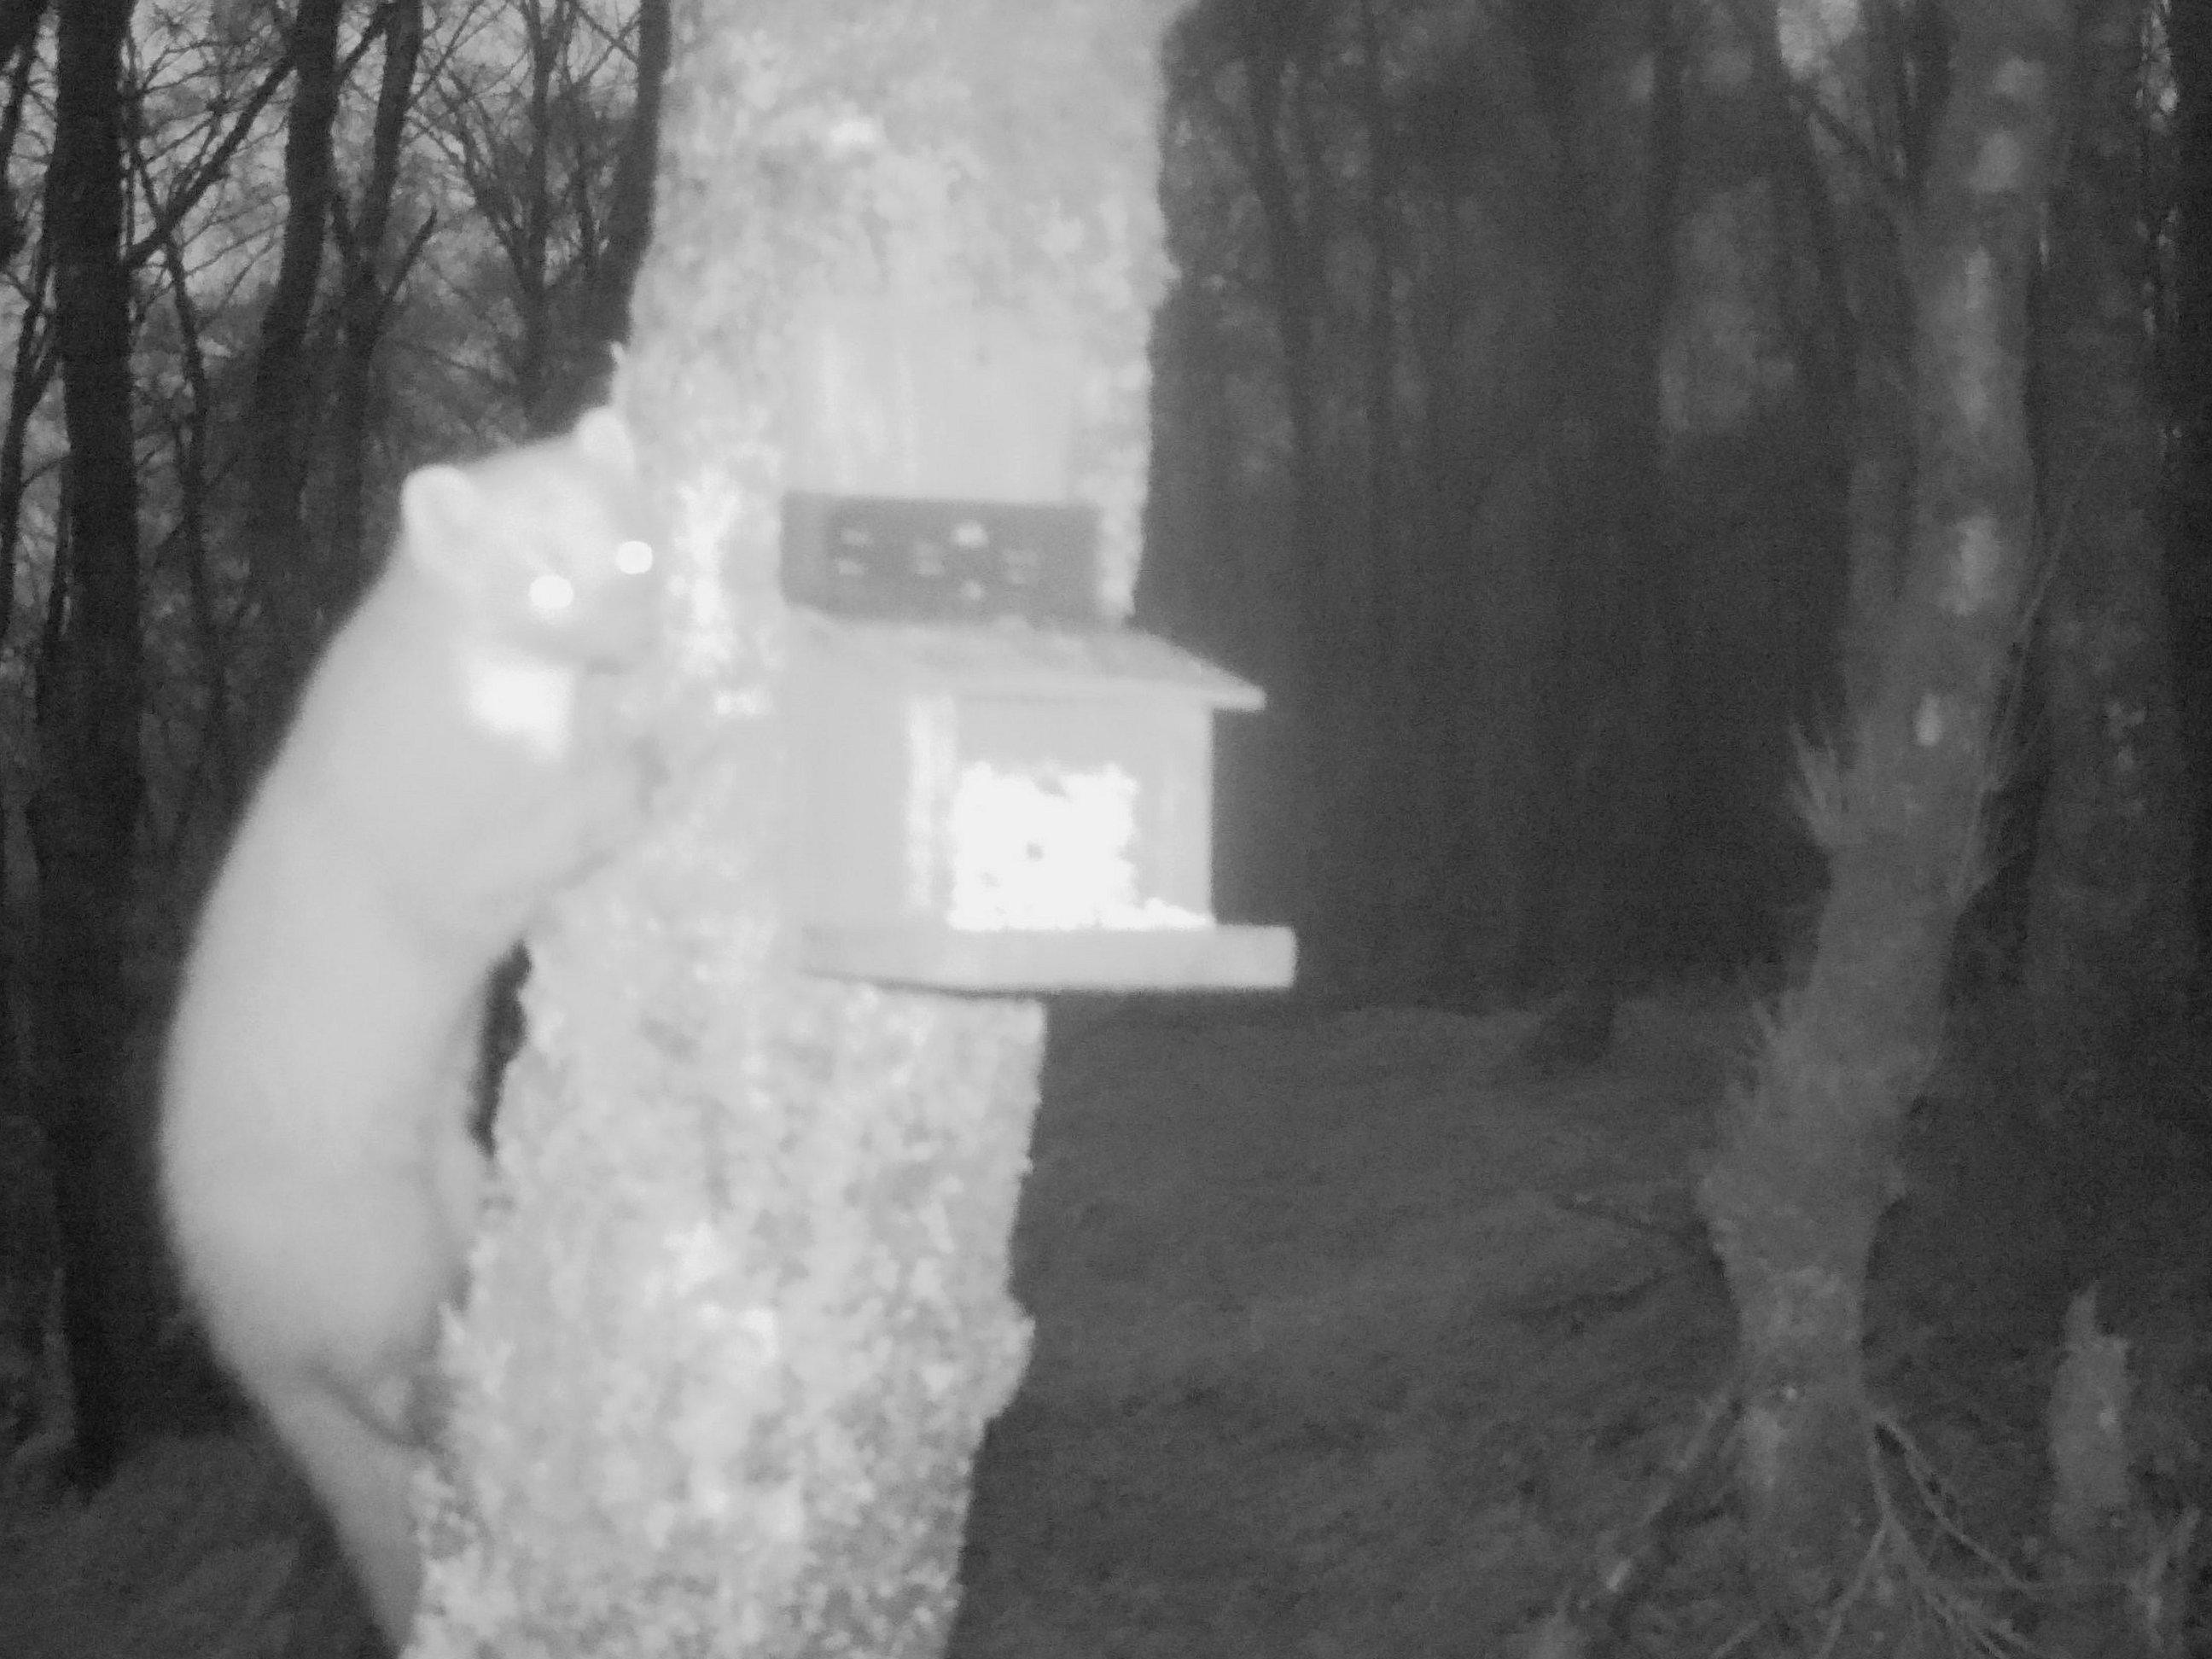 A pine marten at a squirrel feeder at night